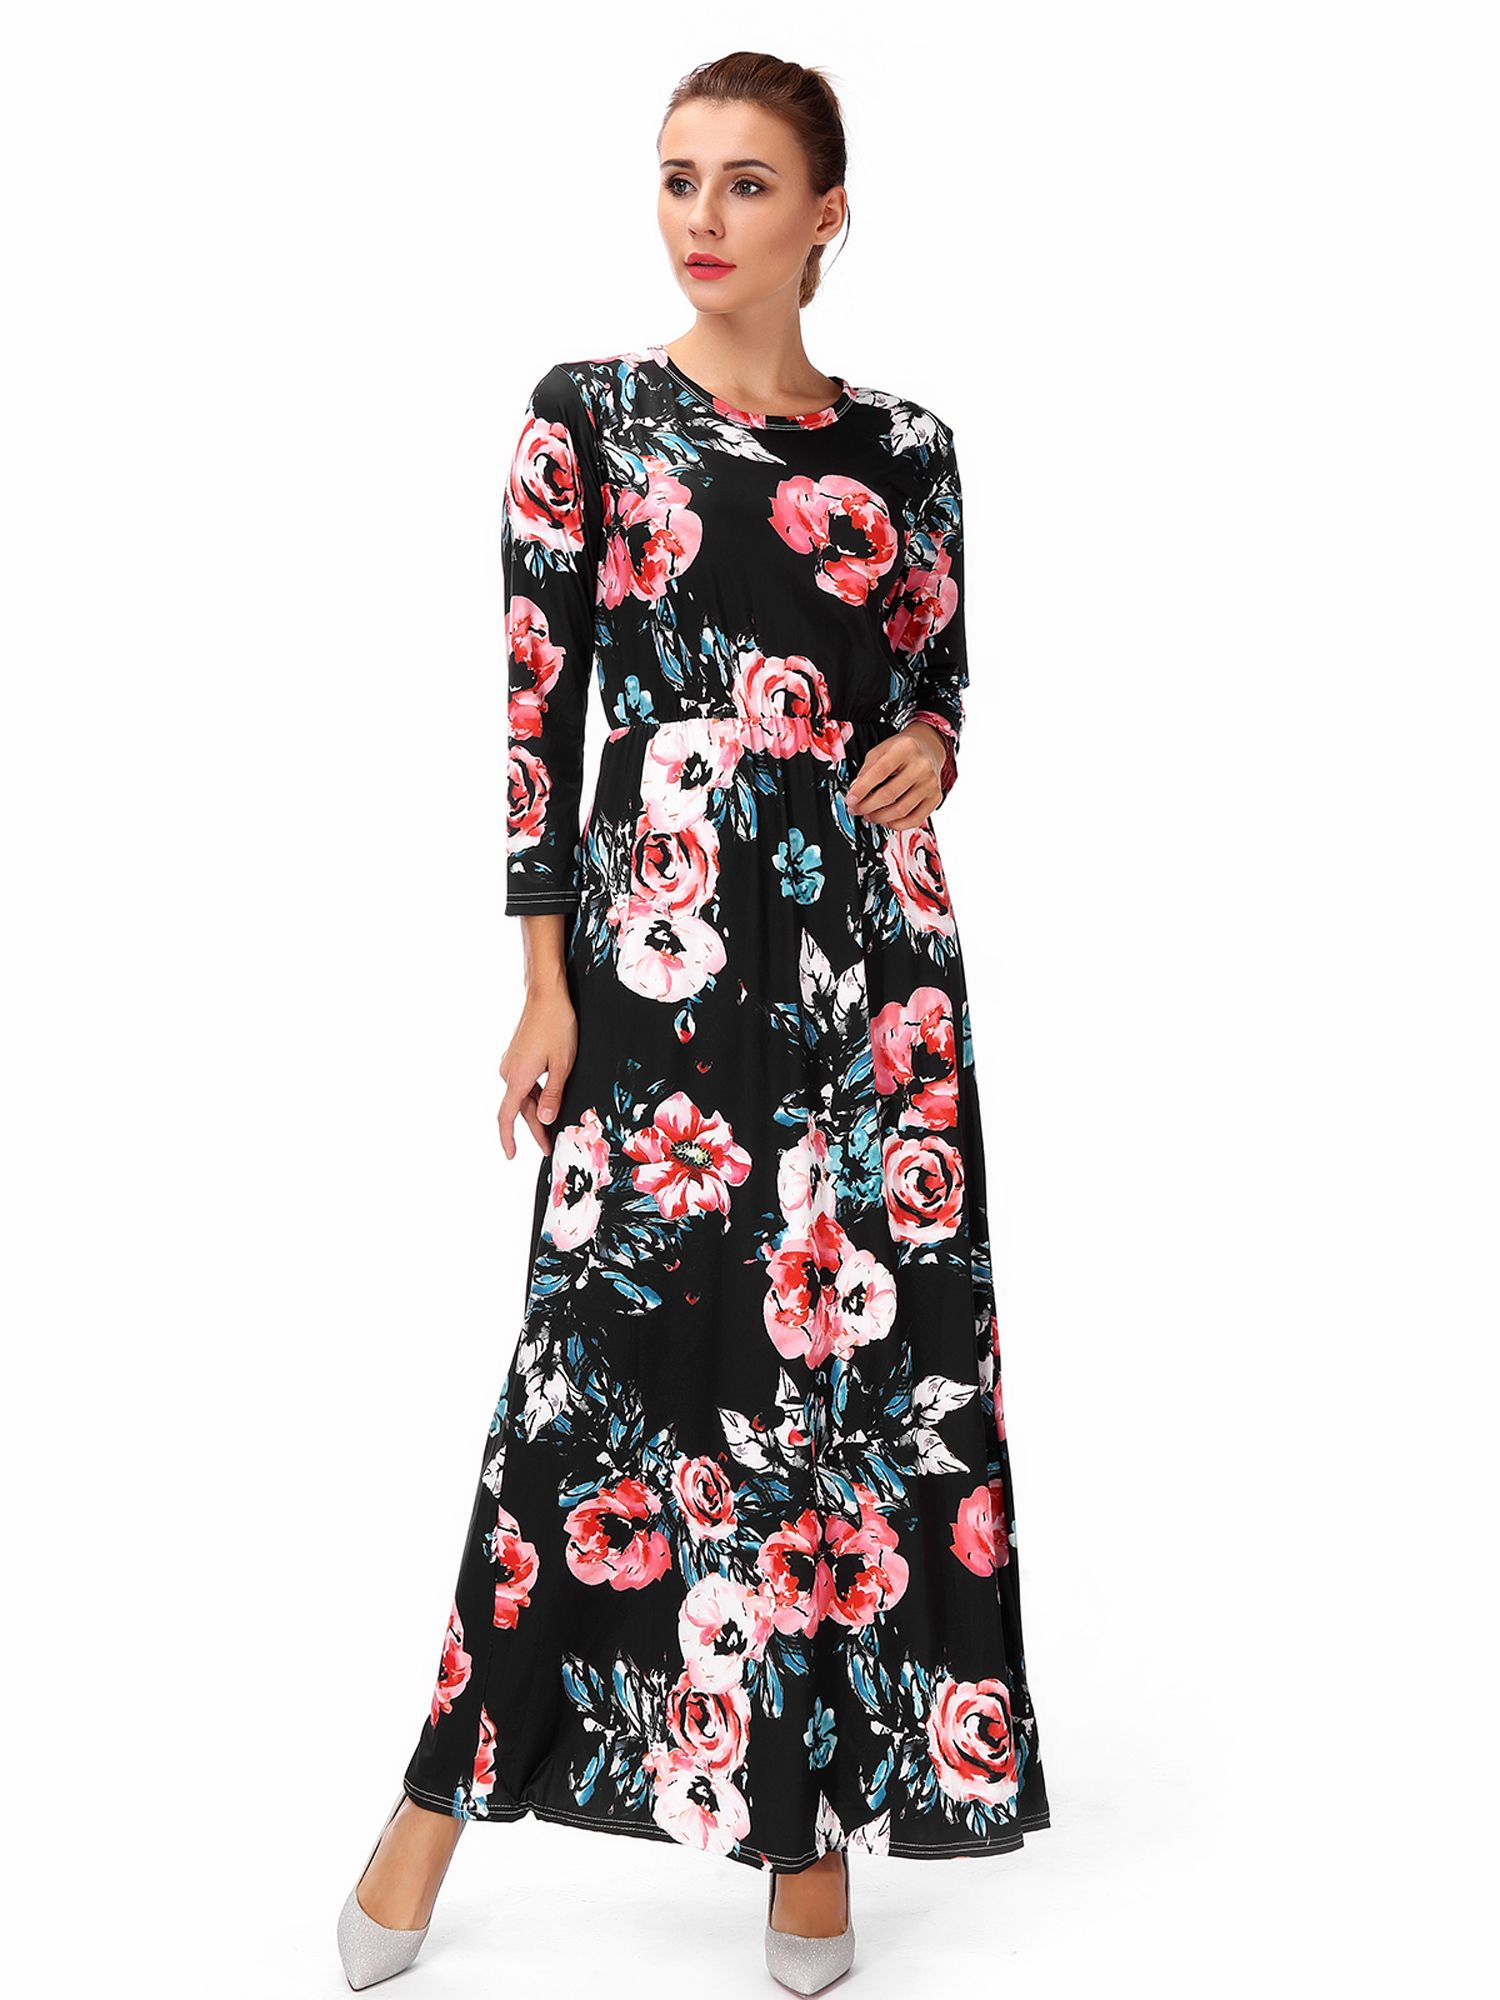 Lelinta Women S Maternity Hight Waistline Long Sleeve Maxi Dress Ink Painting Floral With Pocket Walmart Com Plus Size Maternity Dresses Maternity Long Dress Long Sleeve Dress [ 2000 x 1500 Pixel ]